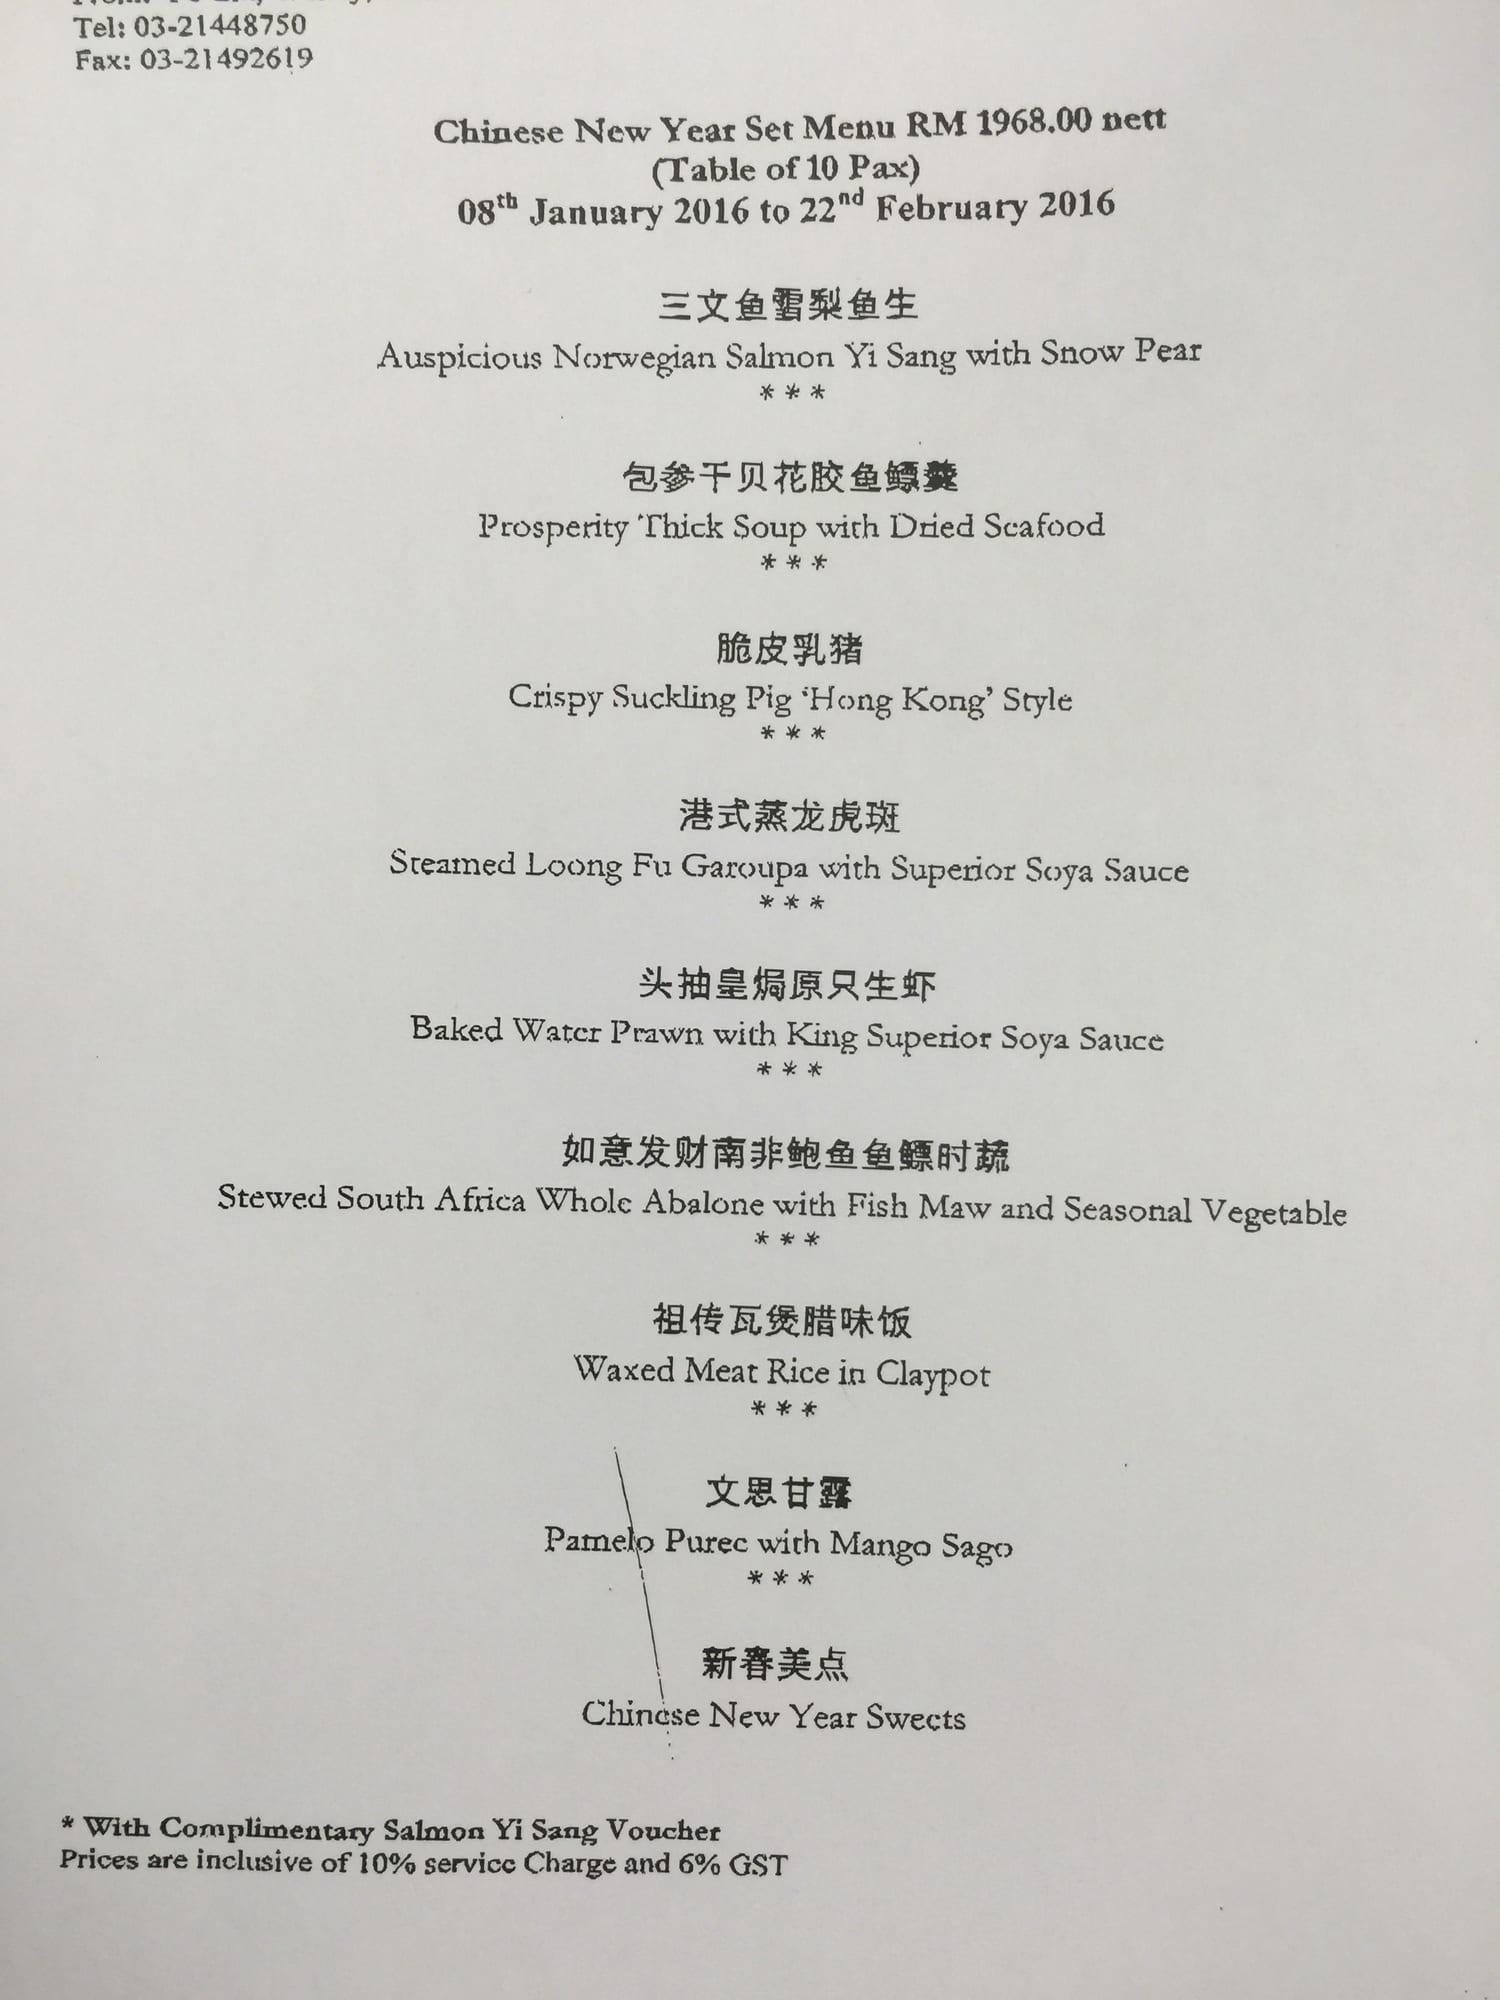 2016 Chinese New Year Set Menus Of 10 Restaurants In Klang Valley